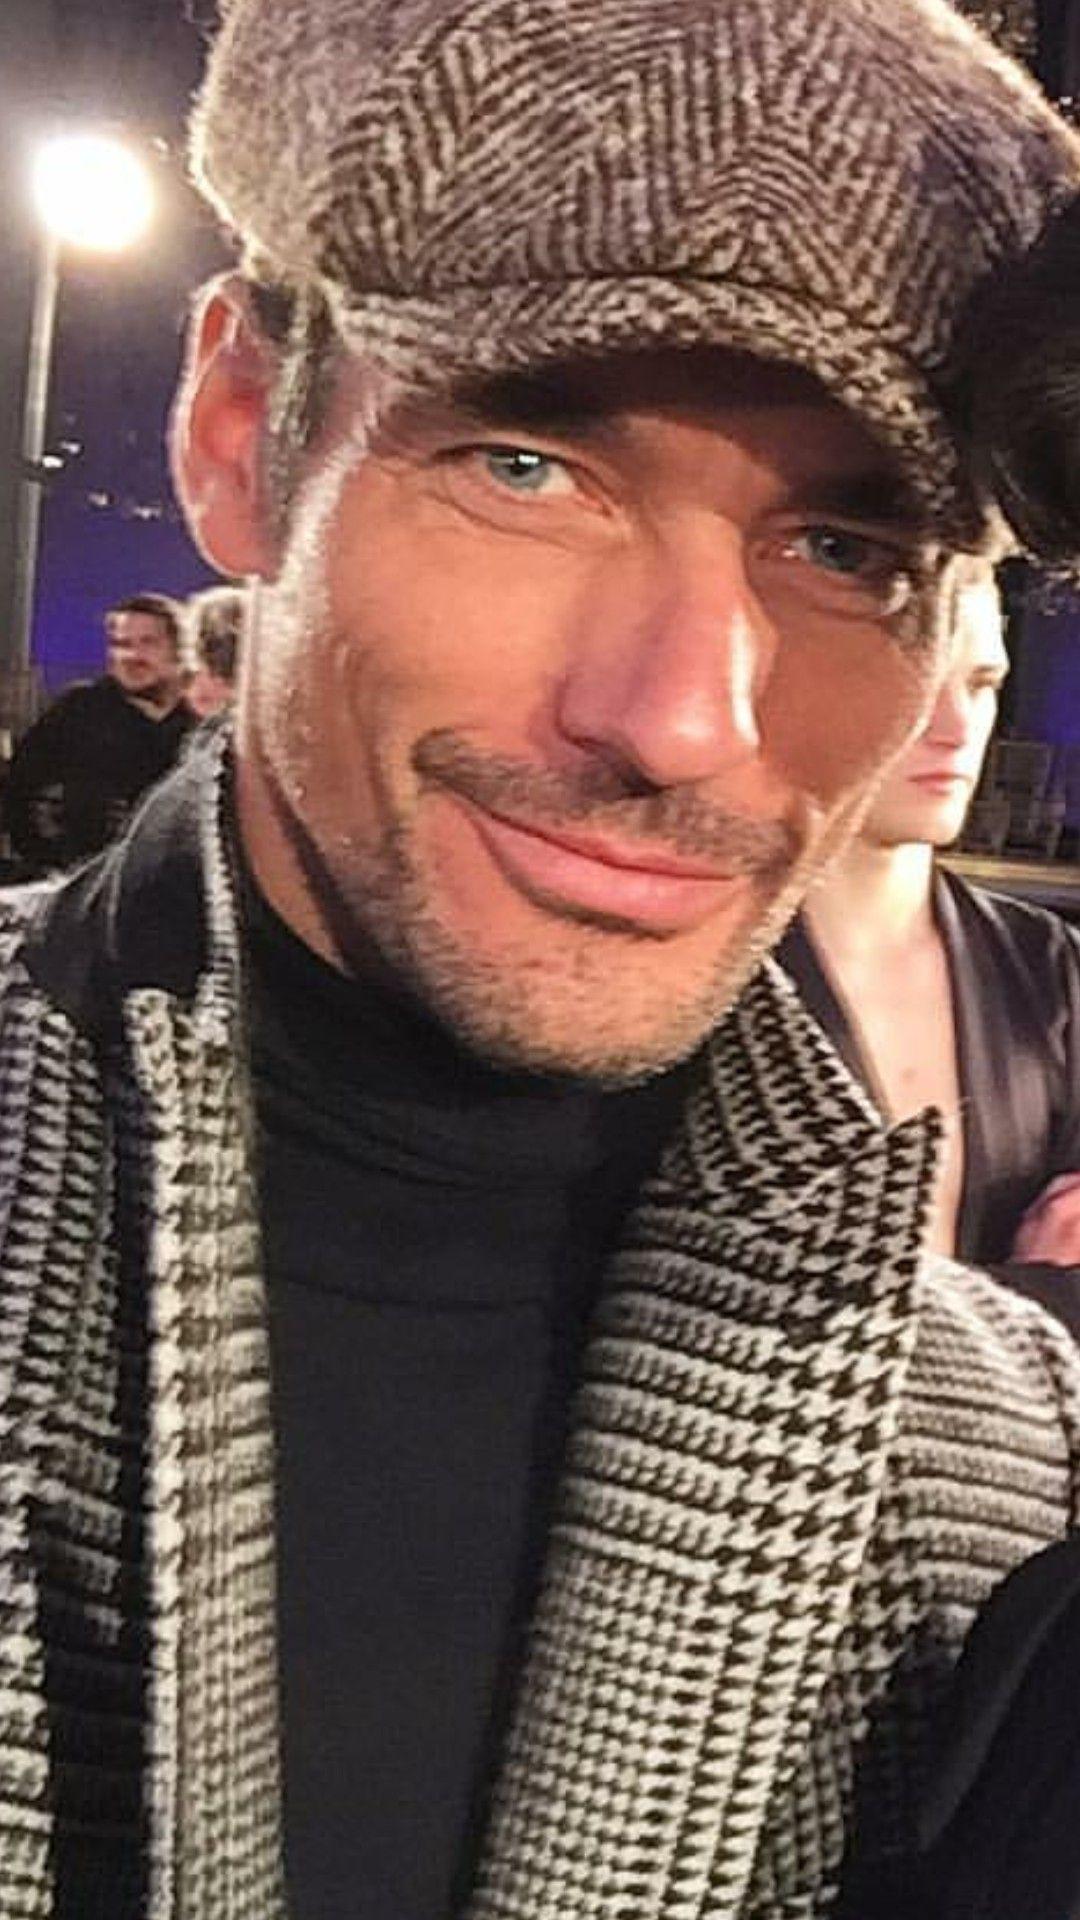 David Gandy Dolce Gabbana Ny April 7 2018 David Gandy